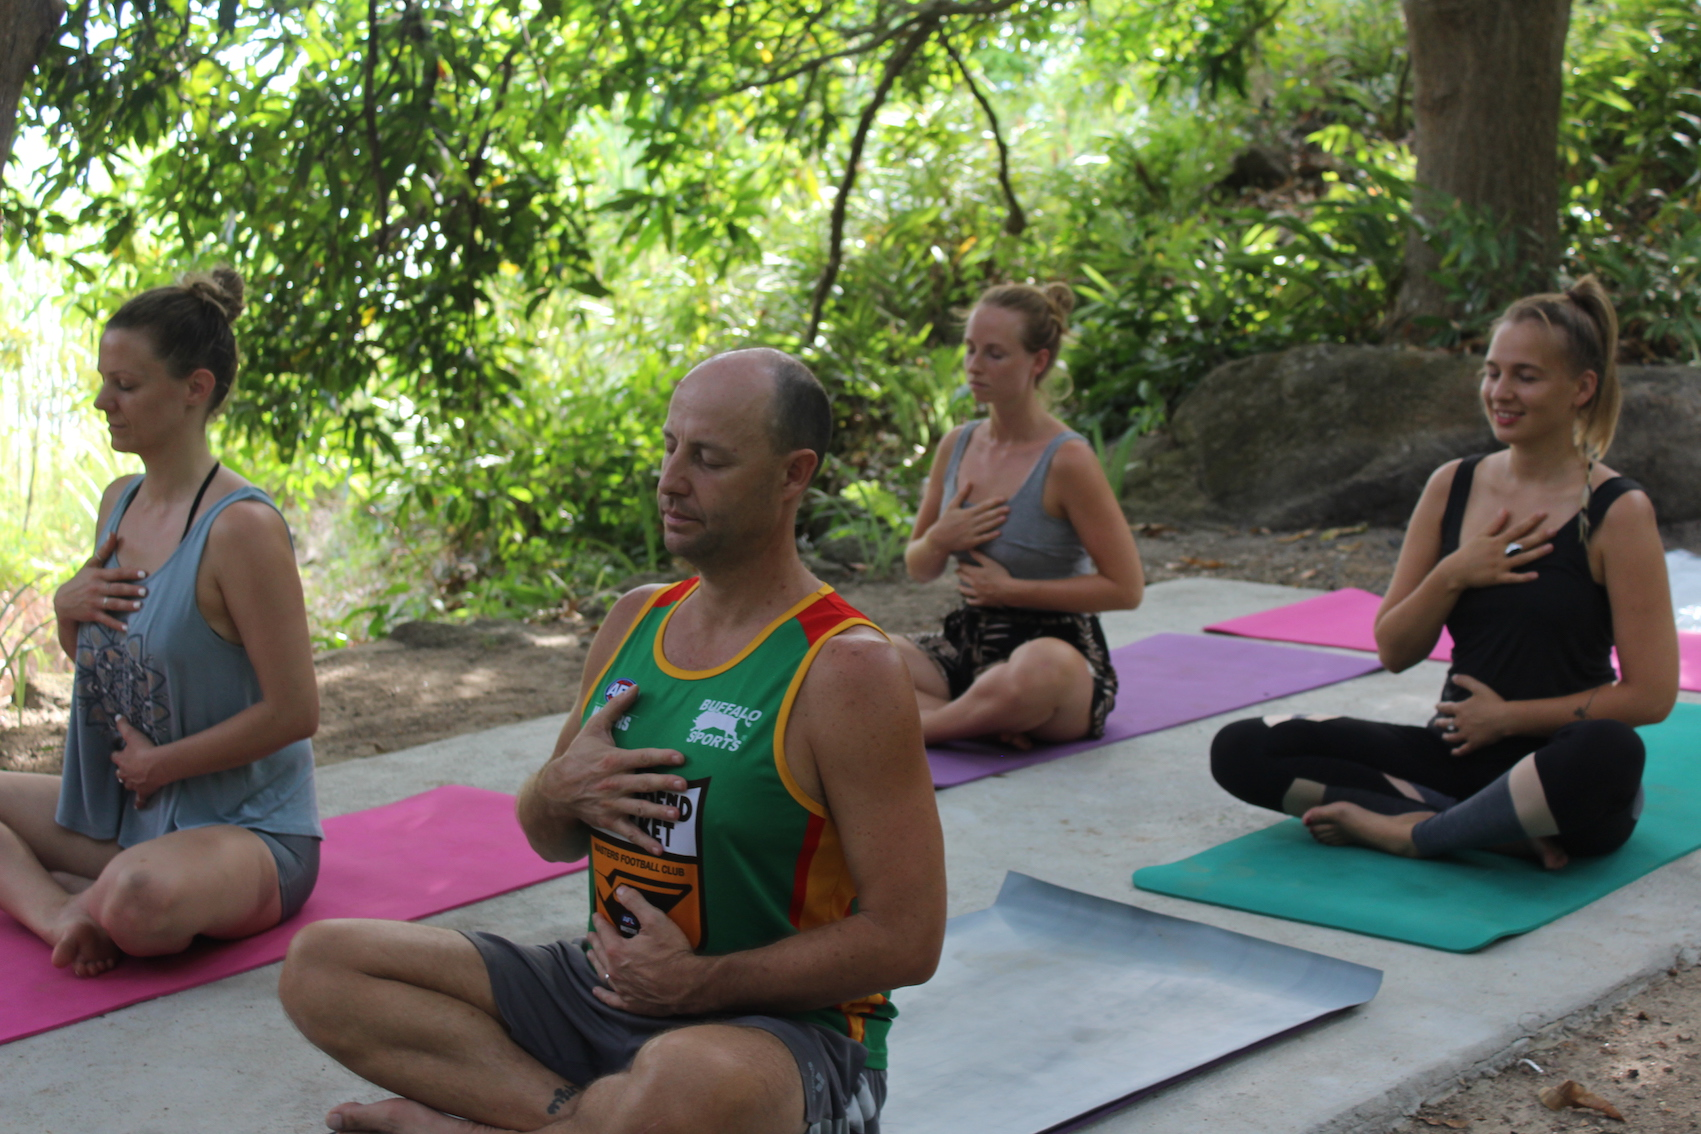 island-smiles-yoga-retreat-class.JPG